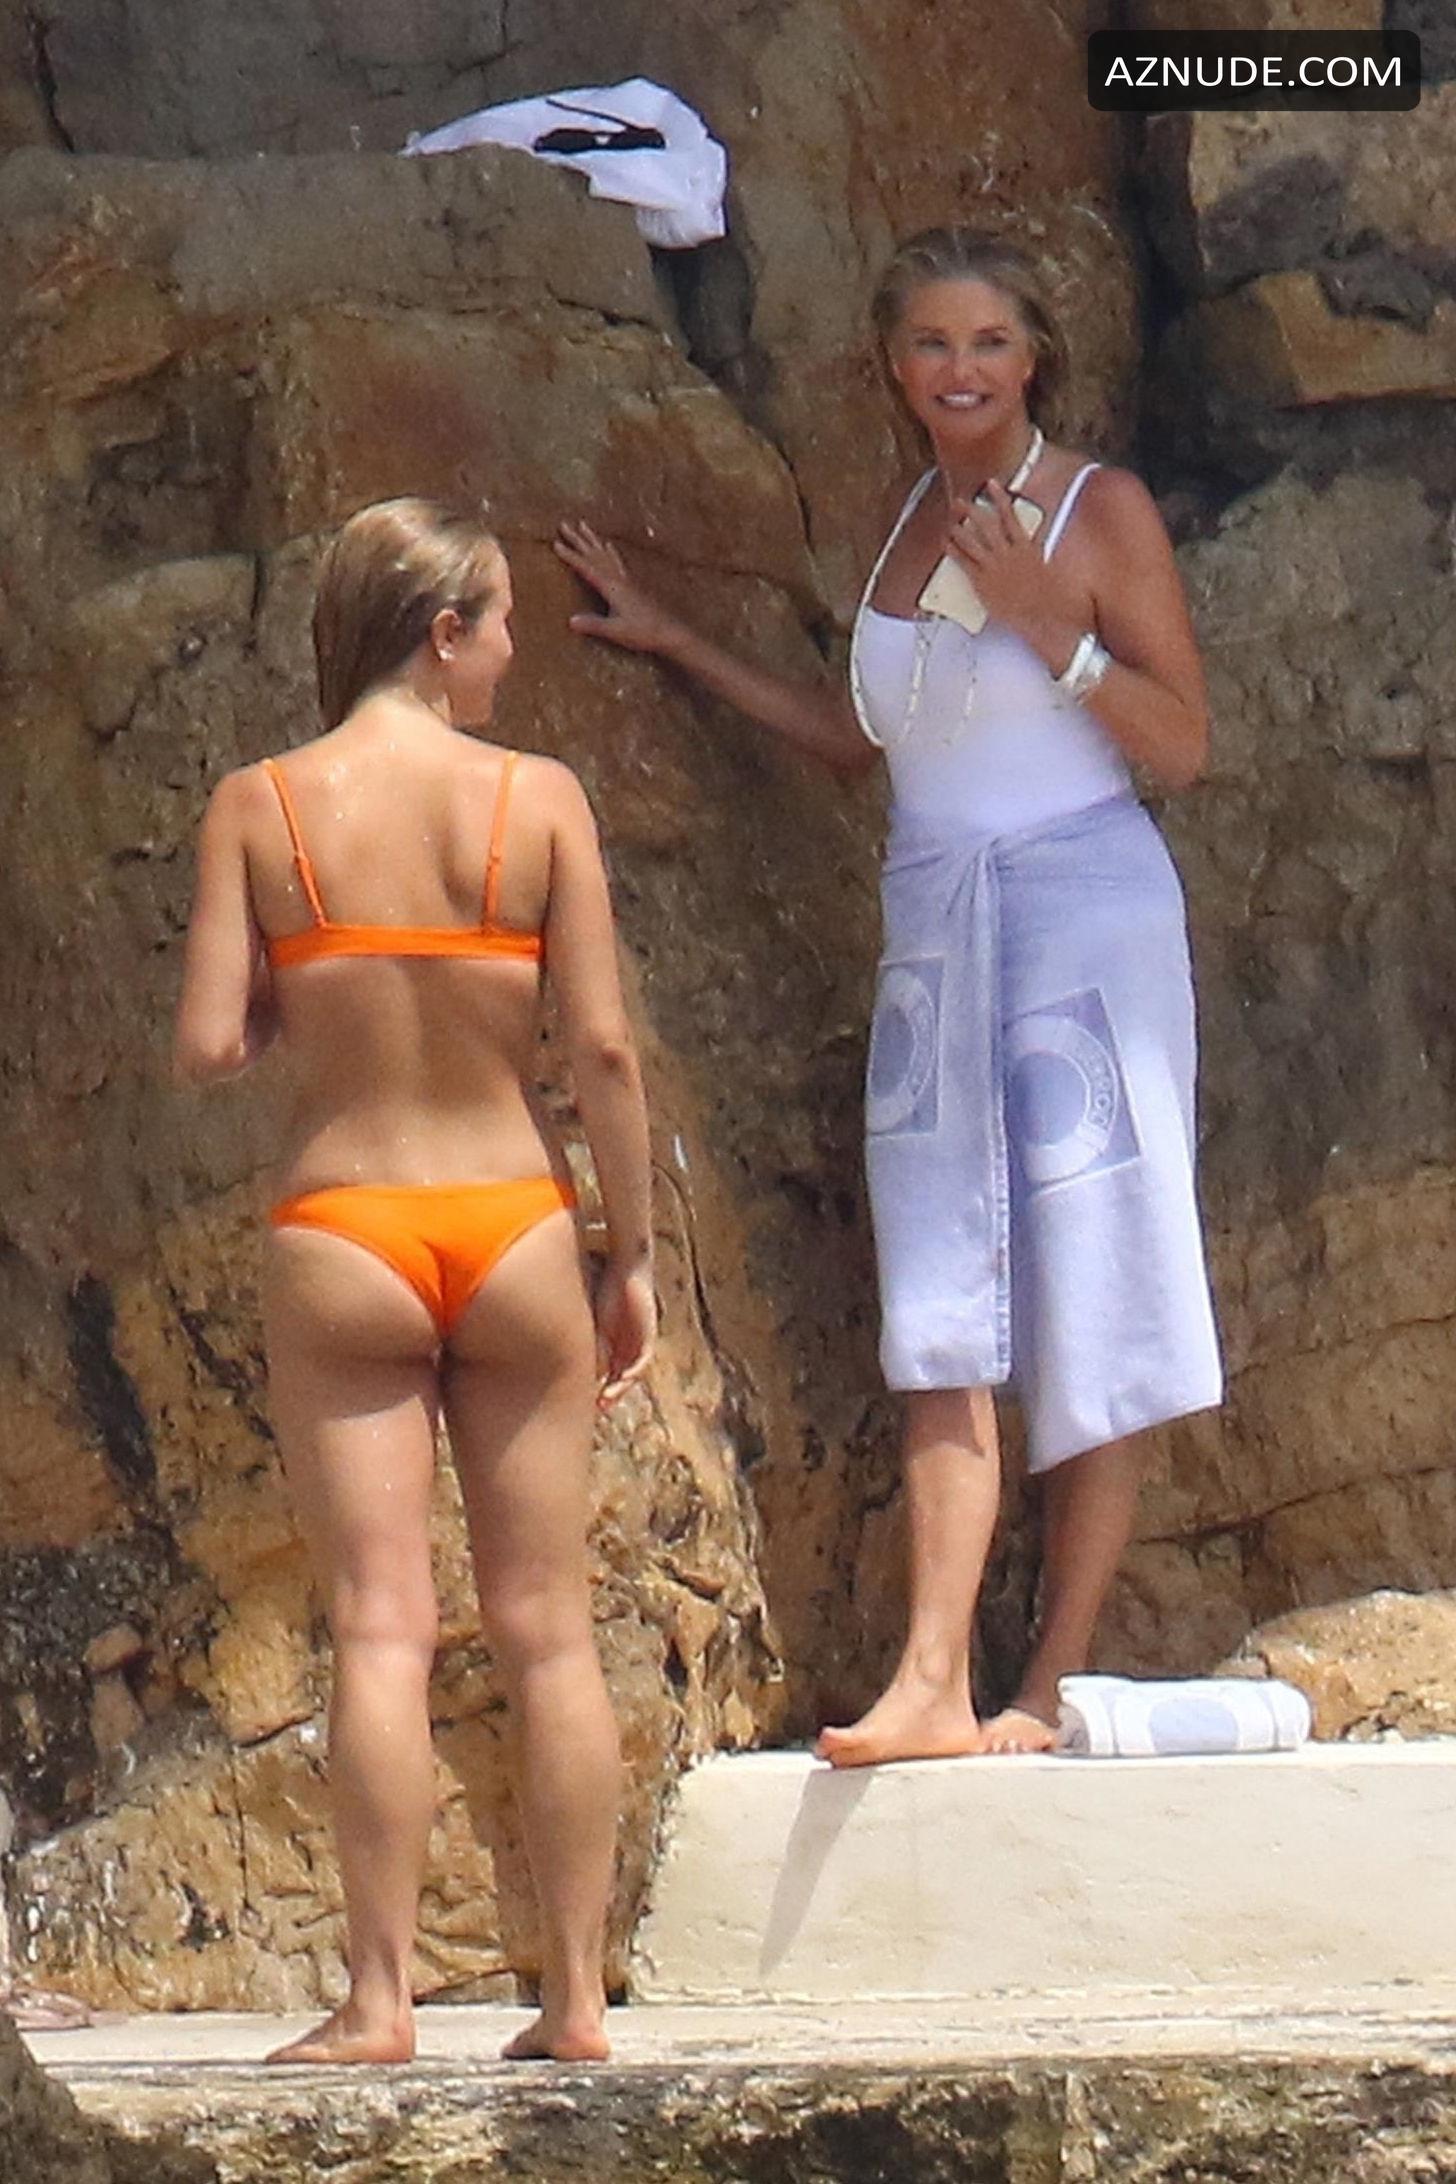 Christie Brinkley Hot Photos Enjoying The Beach With Her -3192